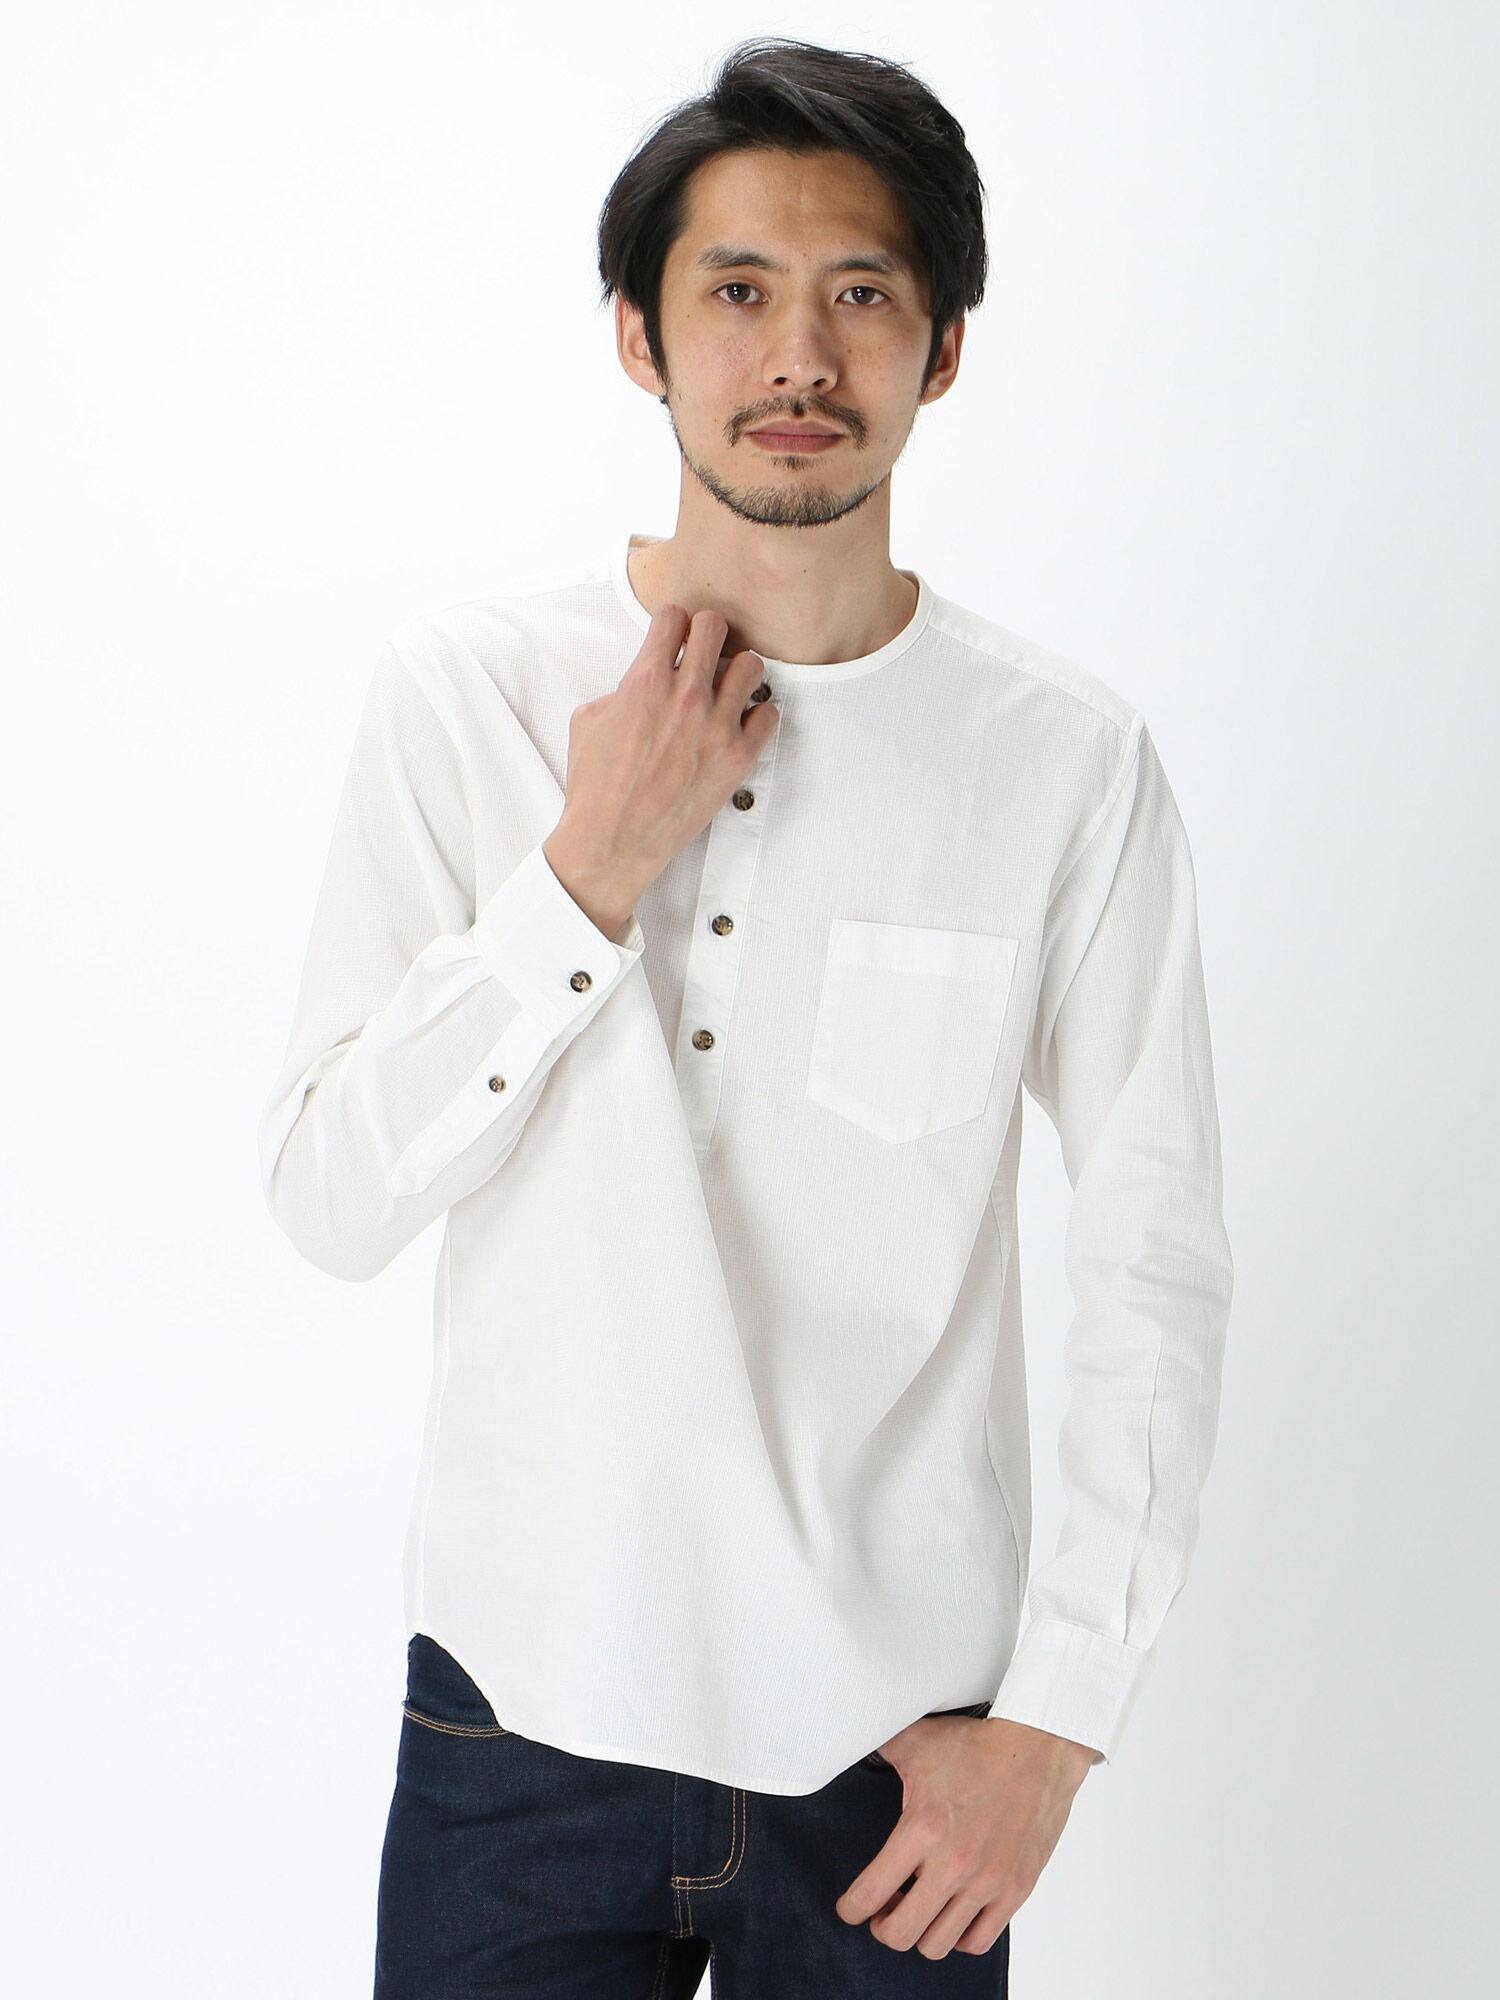 Men'sコンパクトメッシュノーカラープルオーバーシャツ